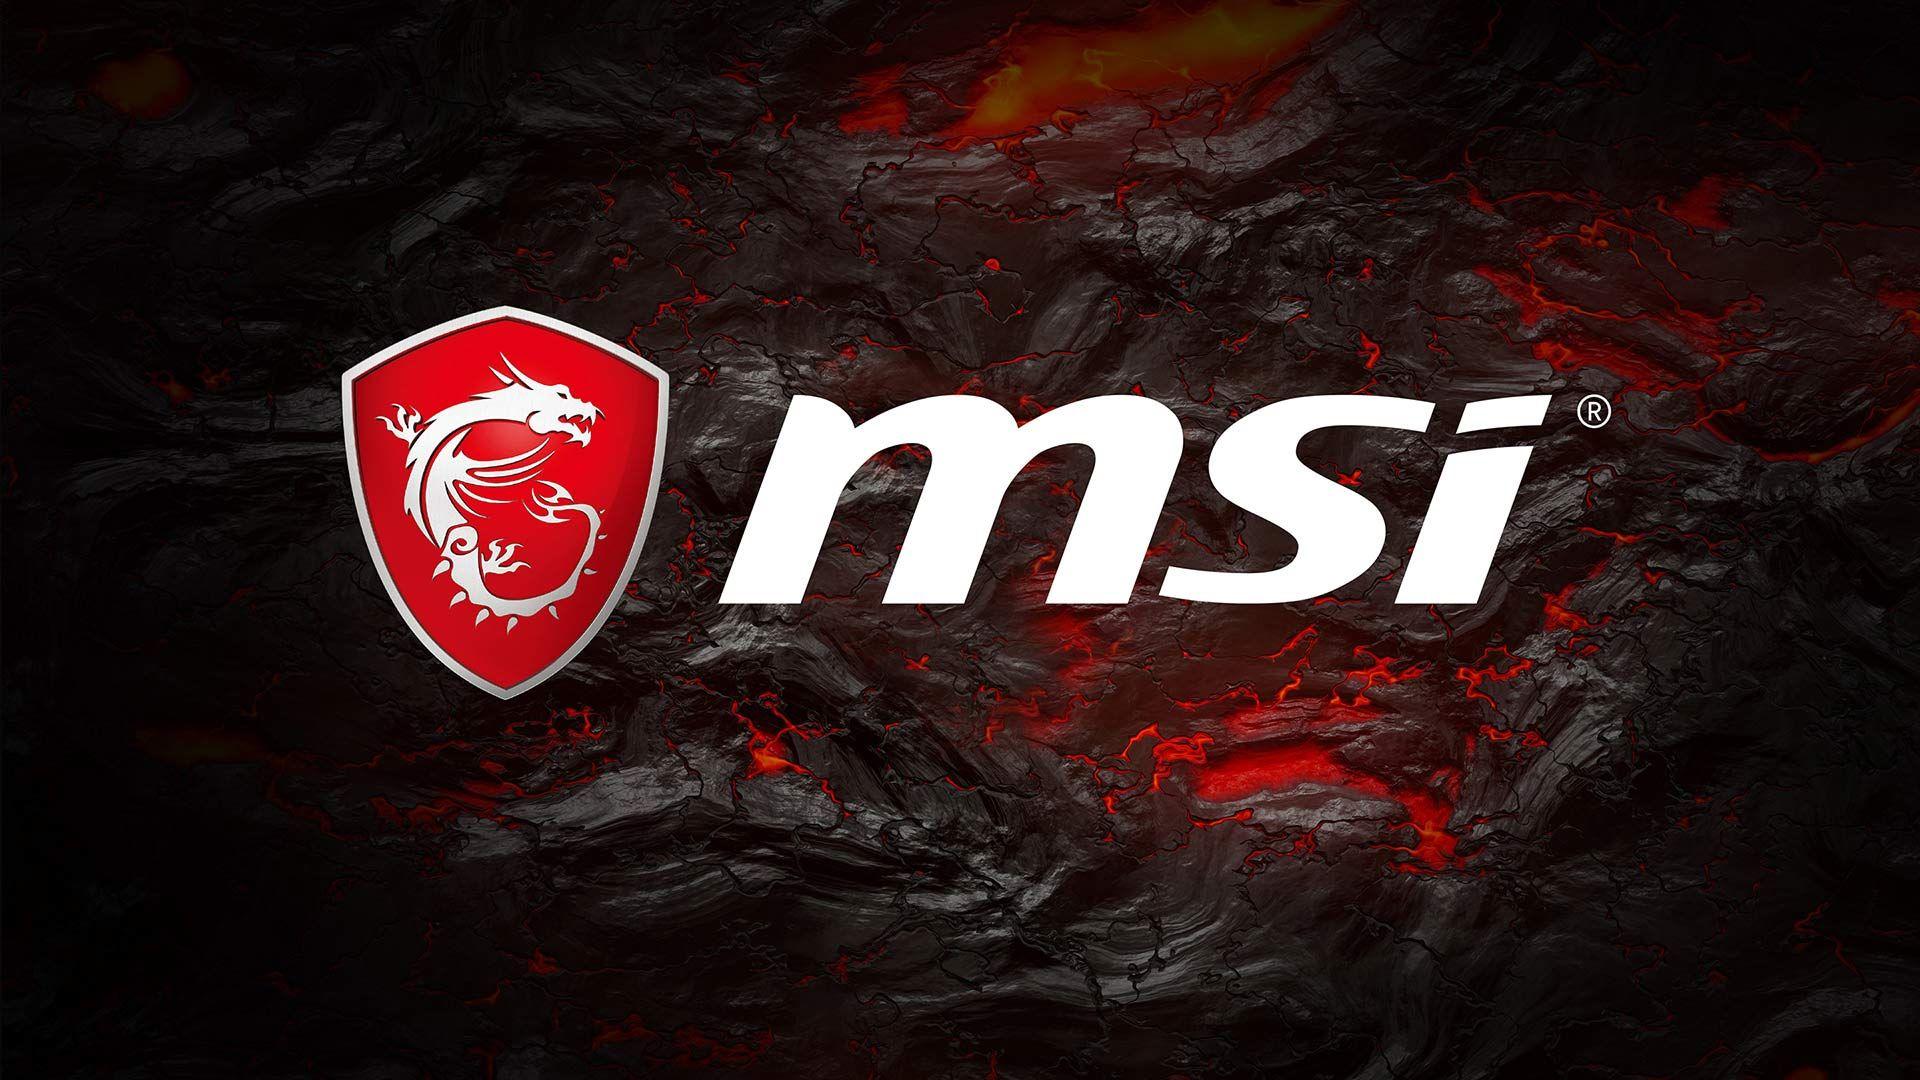 Msi Arsenal Gaming Wallpaper In 2020 Msi Logo Gaming Wallpapers Msi